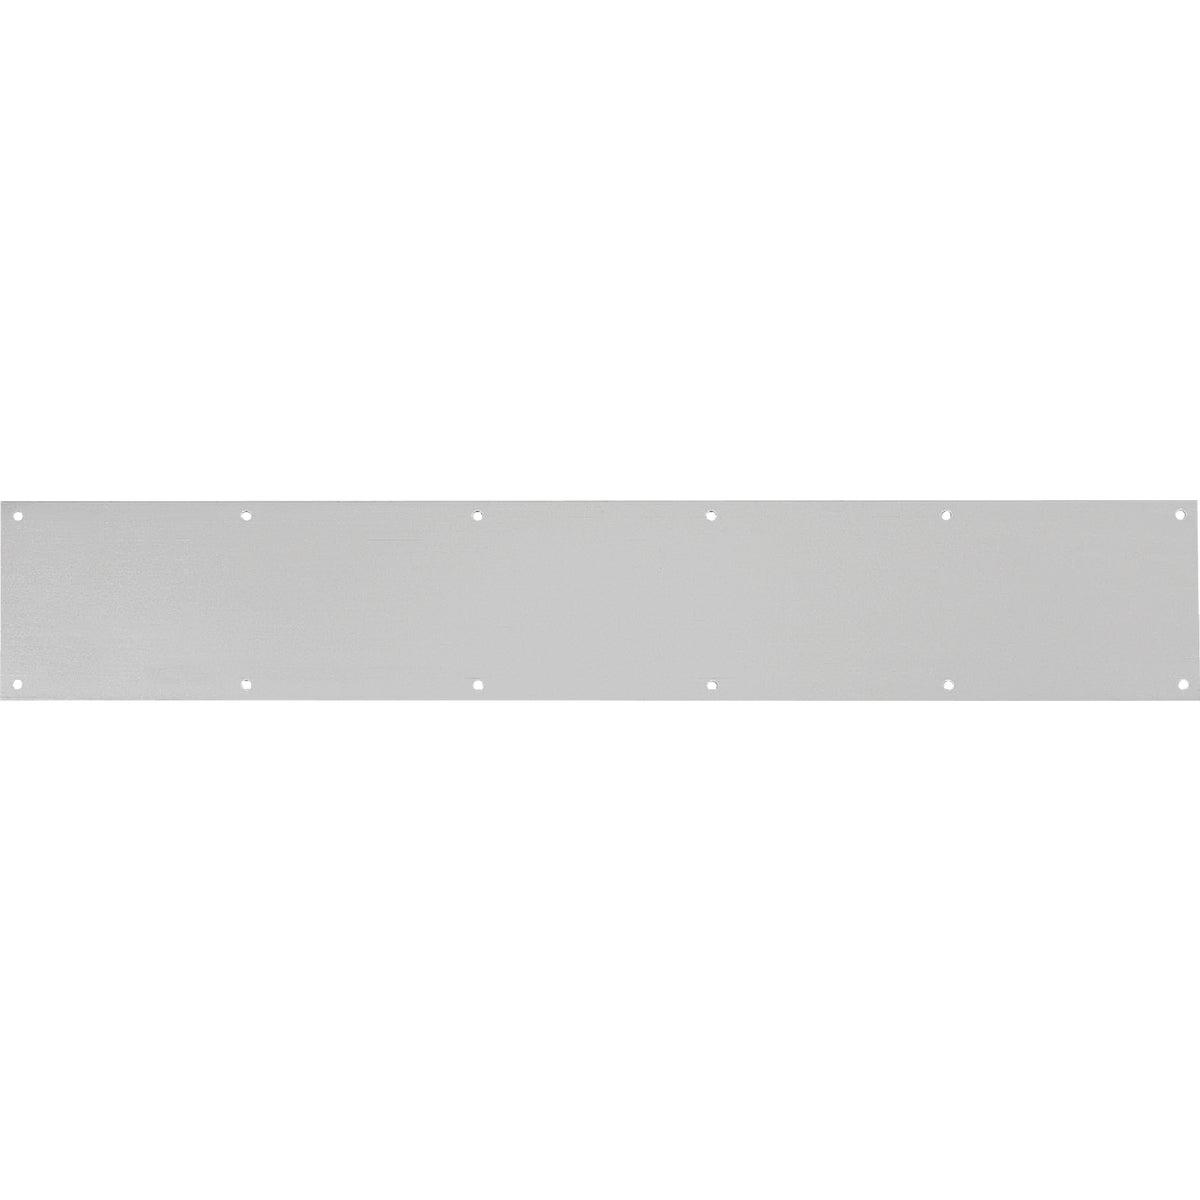 6 X 34 28 CS KICK PLATE - DT100056 by Tell Mfg Inc